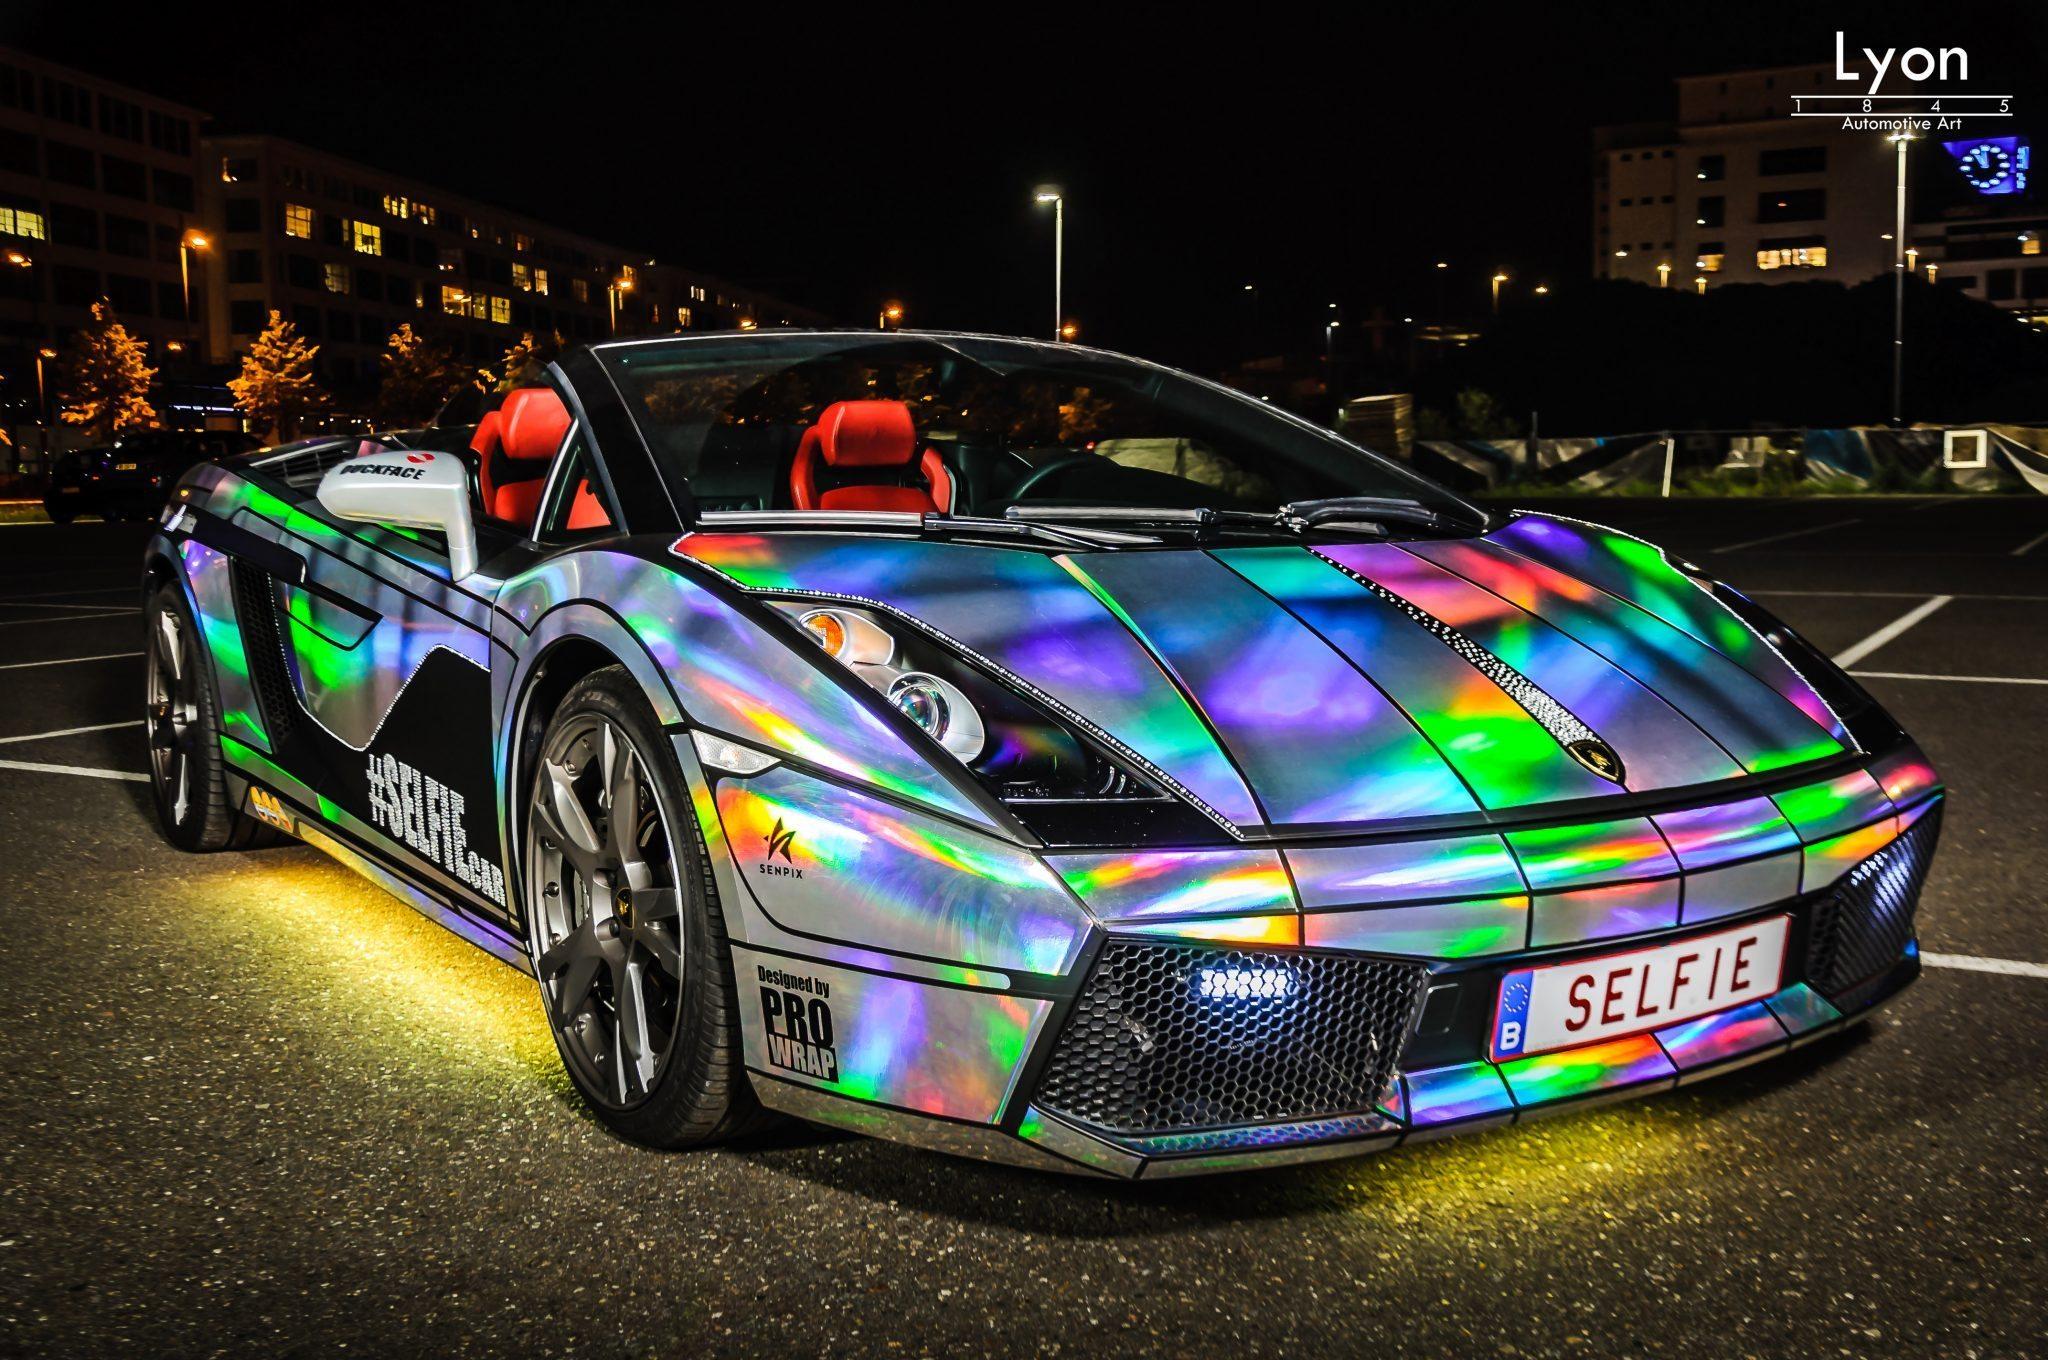 Lamborghini Aventador Spyder >> Unieke creatie: Lamborghini Gallardo Spyder 'SelfieCar' | Hartvoorautos.nl